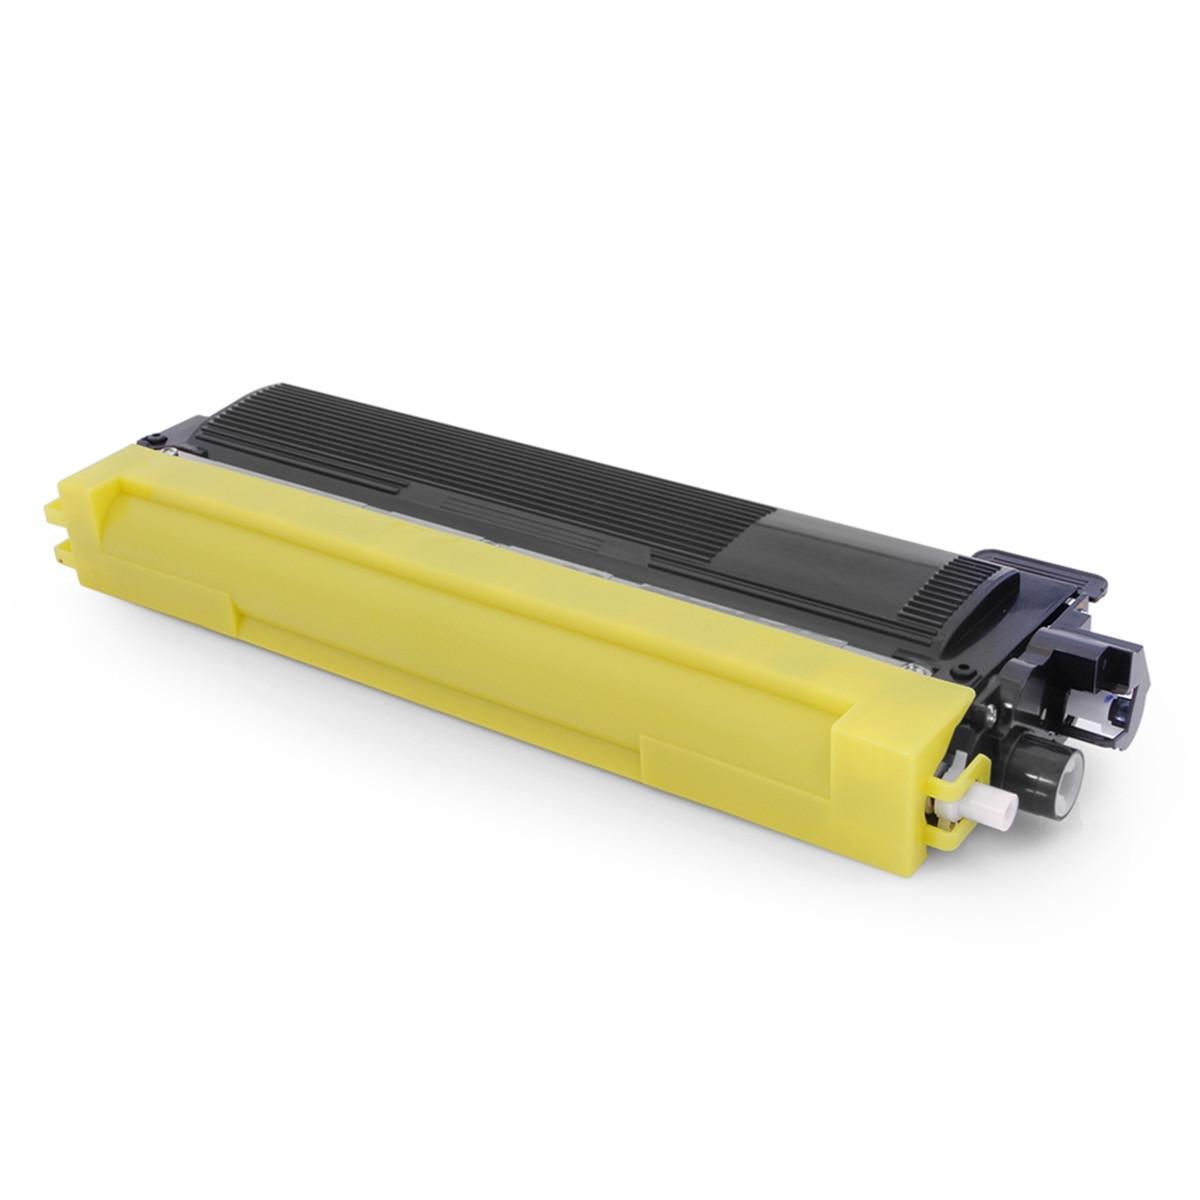 Toner Compatível com Brother TN210C TN210 Ciano | HL8070 3040CN MFC9010CN MFC9320CW | Importado 1.4k